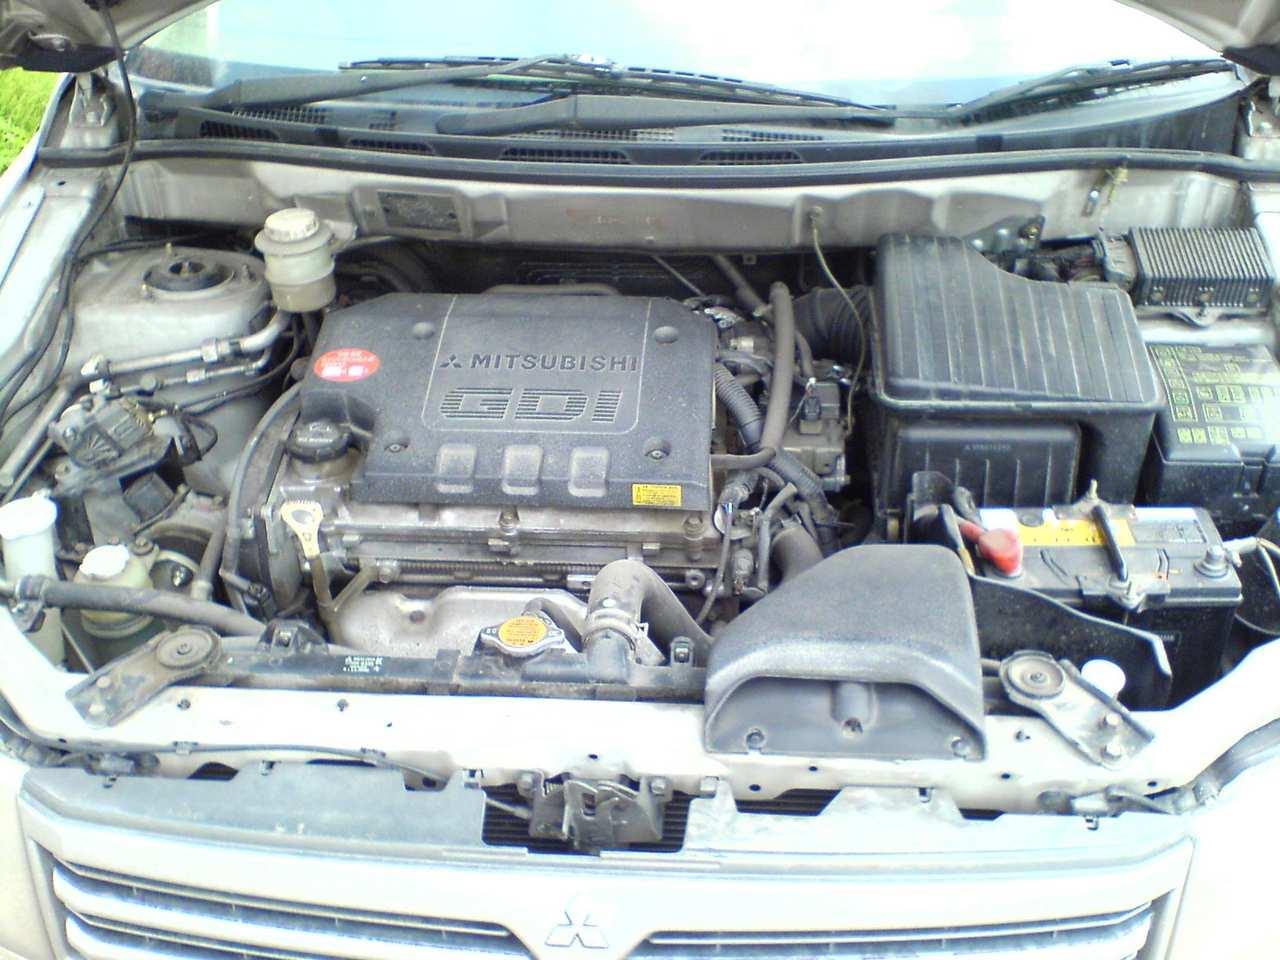 2000 mitsubishi chariot grandis pictures 2400cc gasoline ff rh cars directory net 2004 Mitsubishi Grandis manual chariot grandis